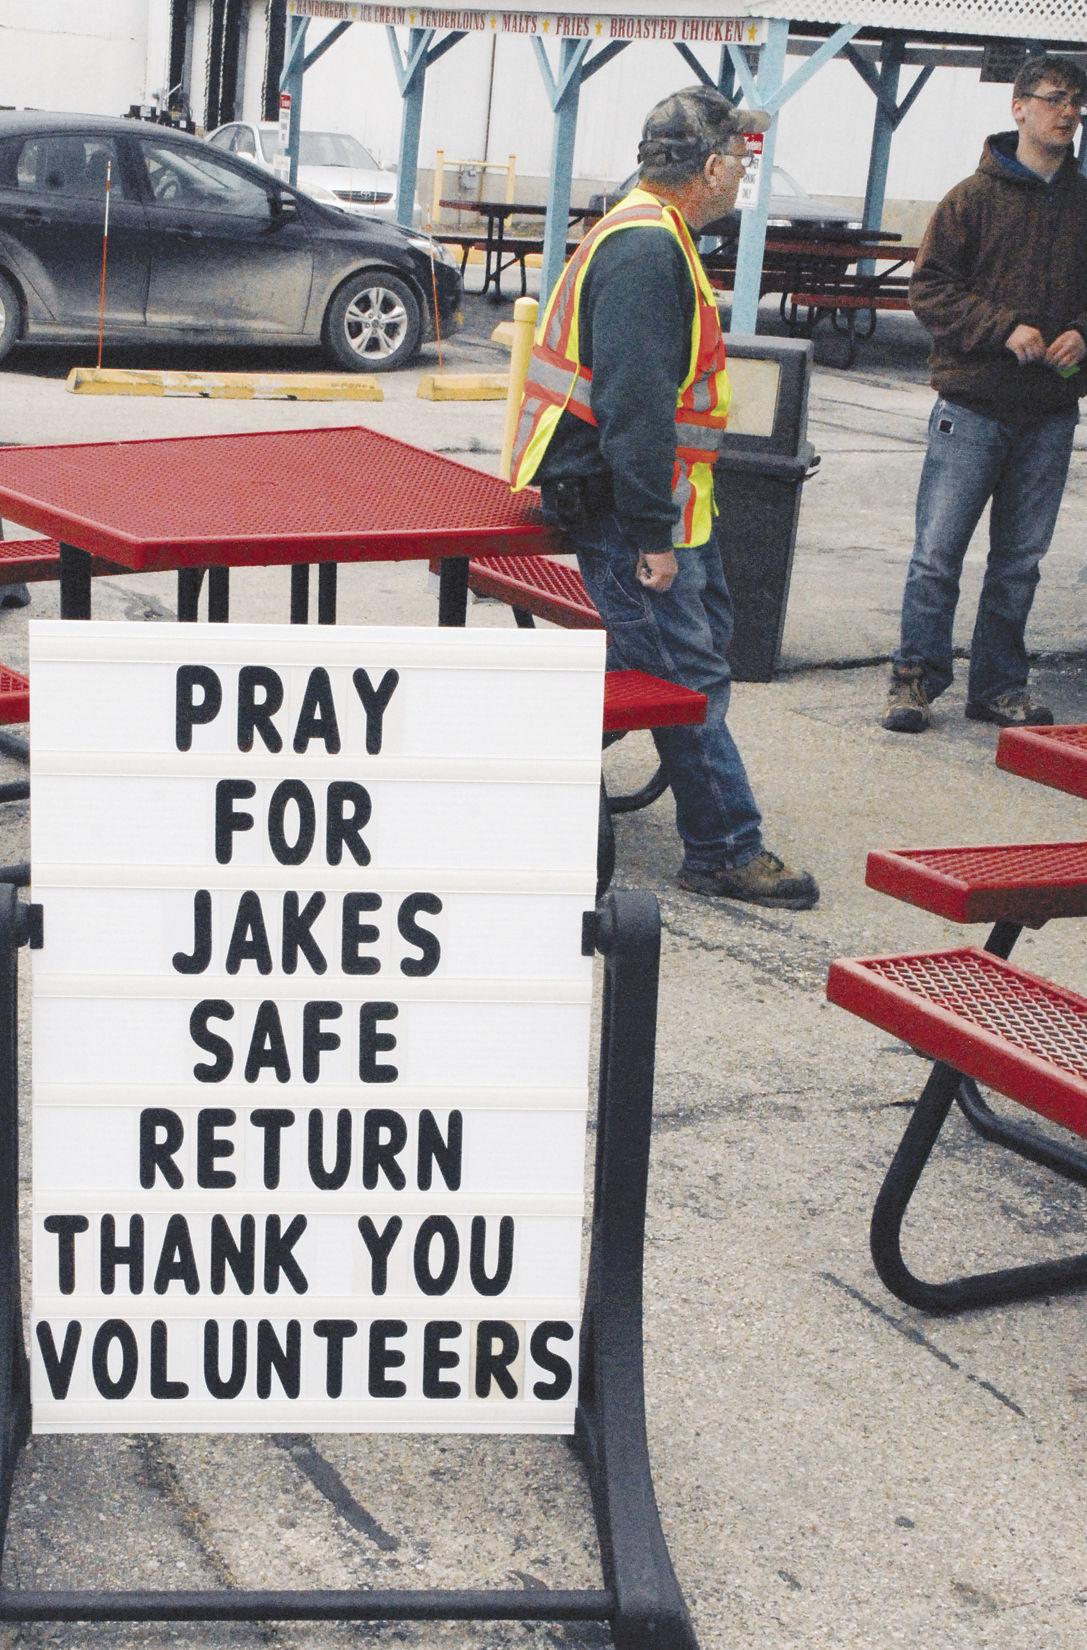 Pray for Jake